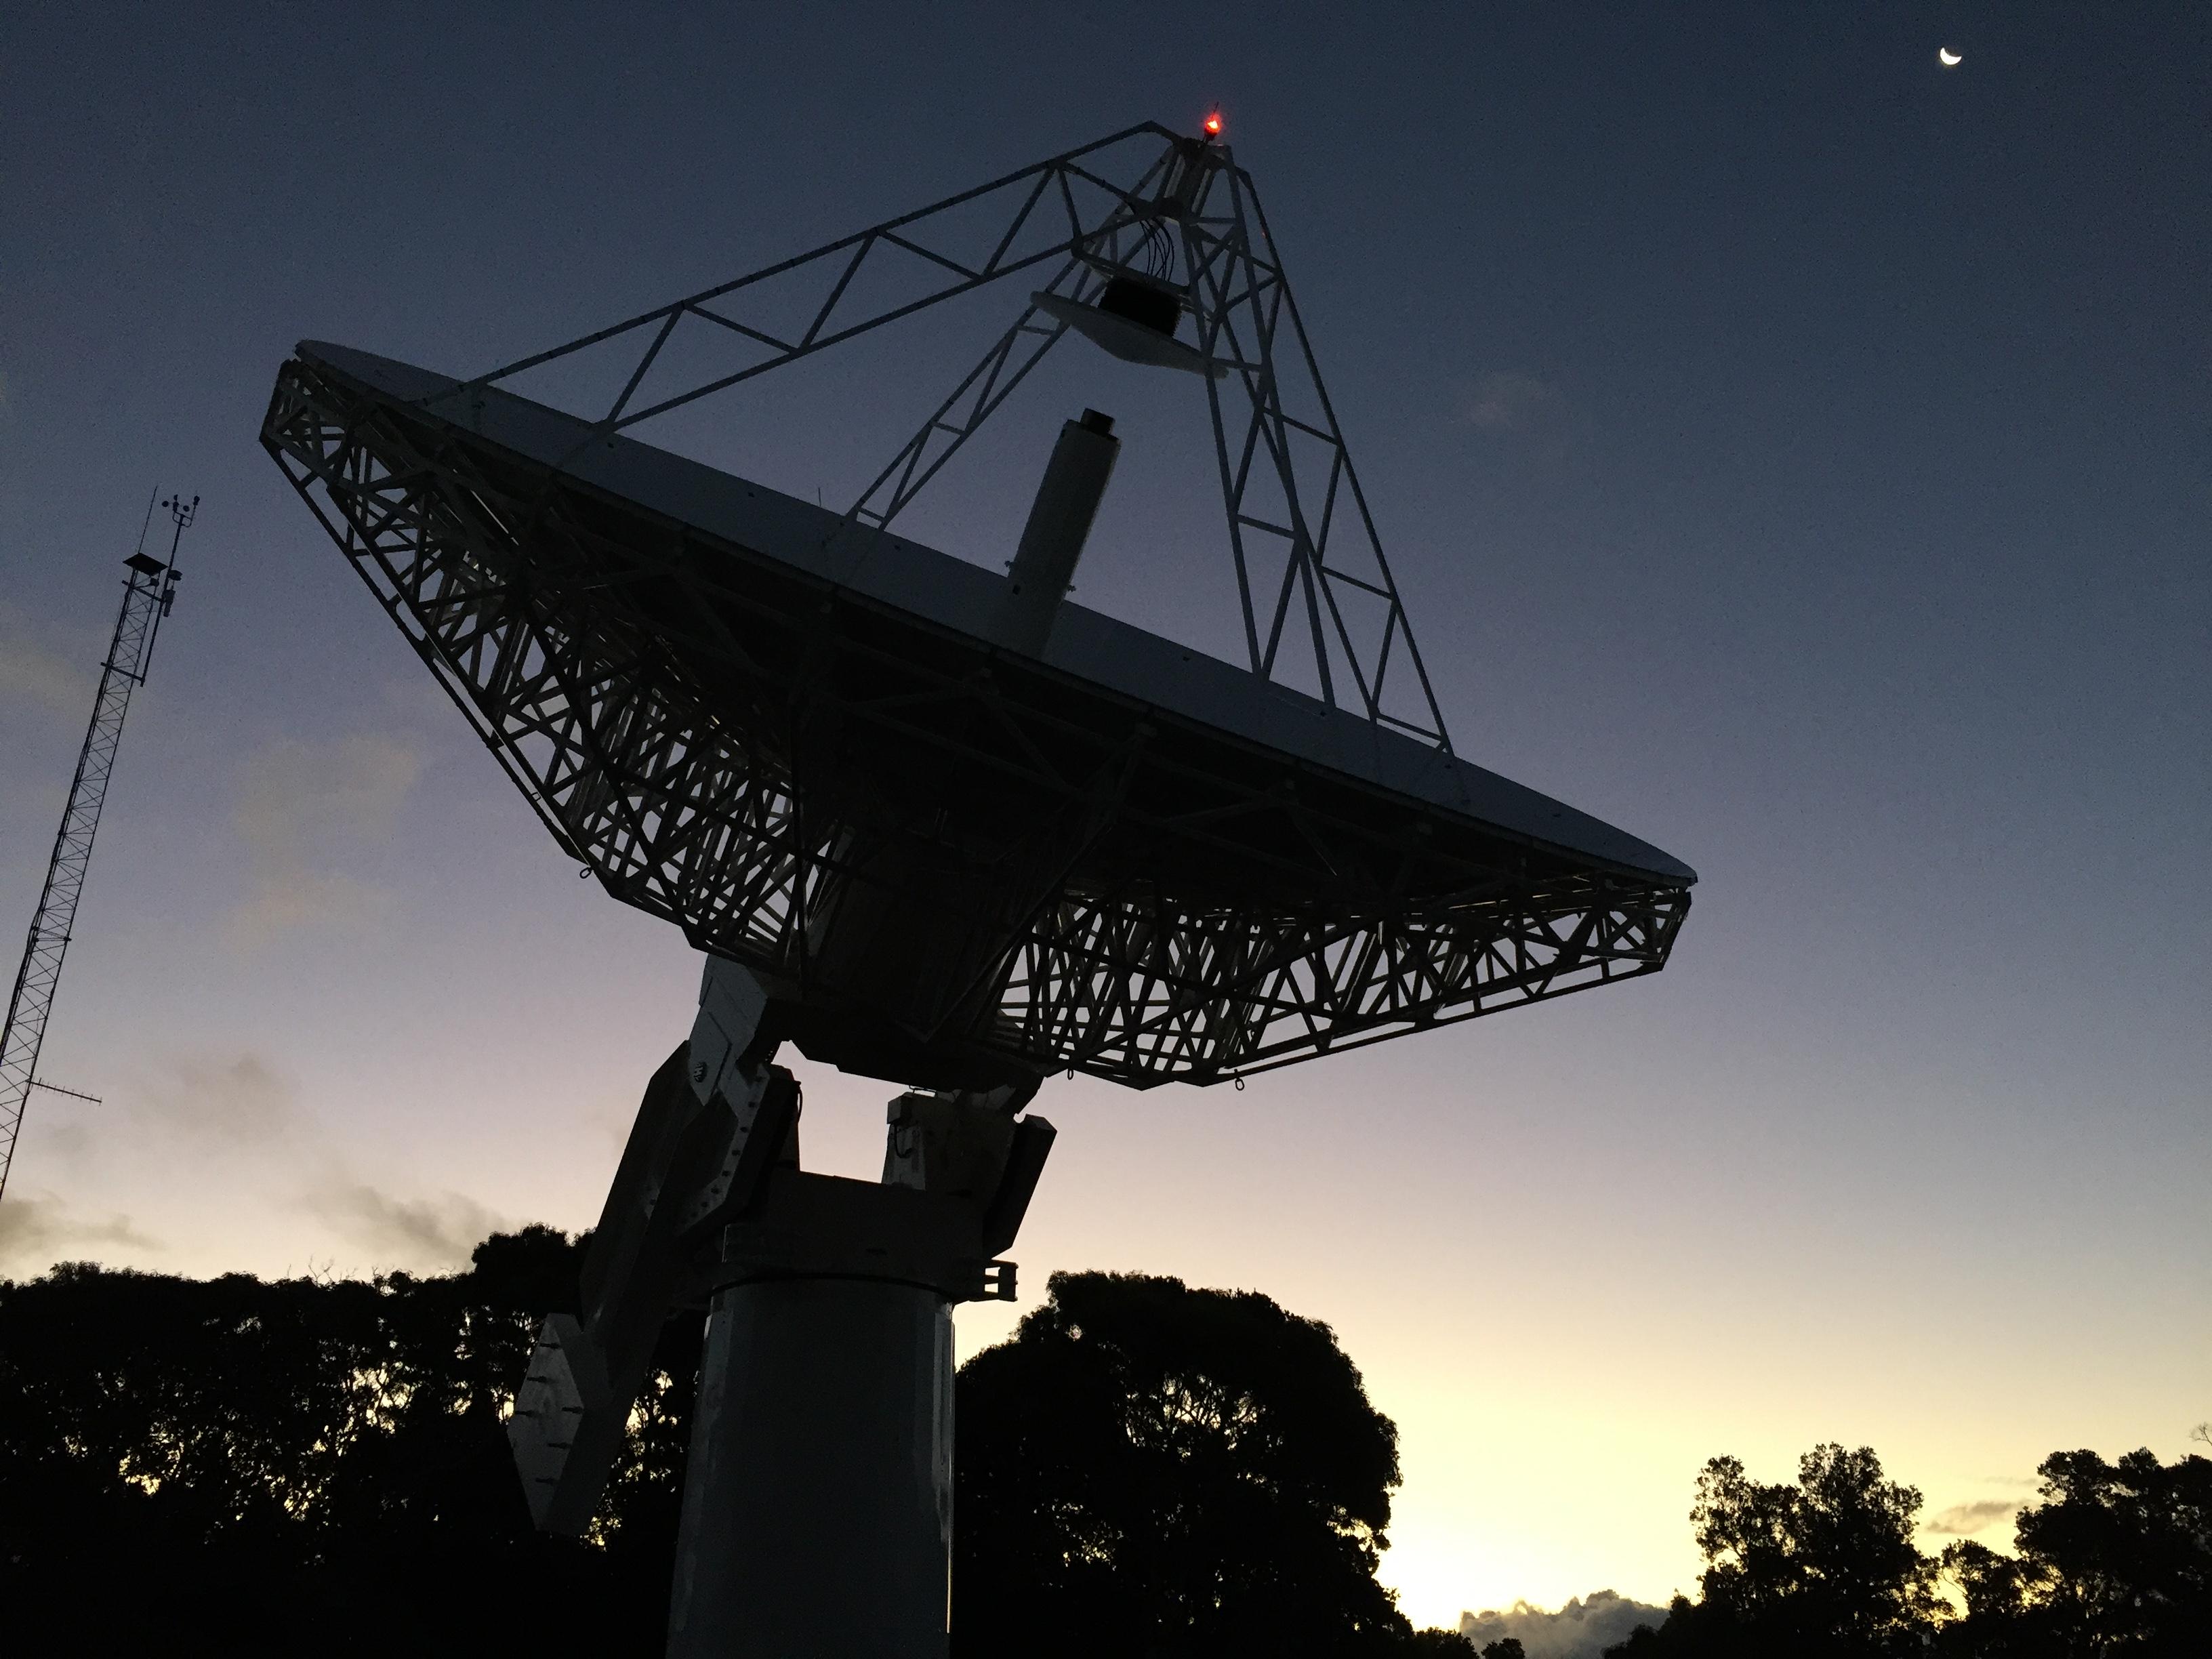 VGOS Station at the Kōke'e Park Geophysical Observatory